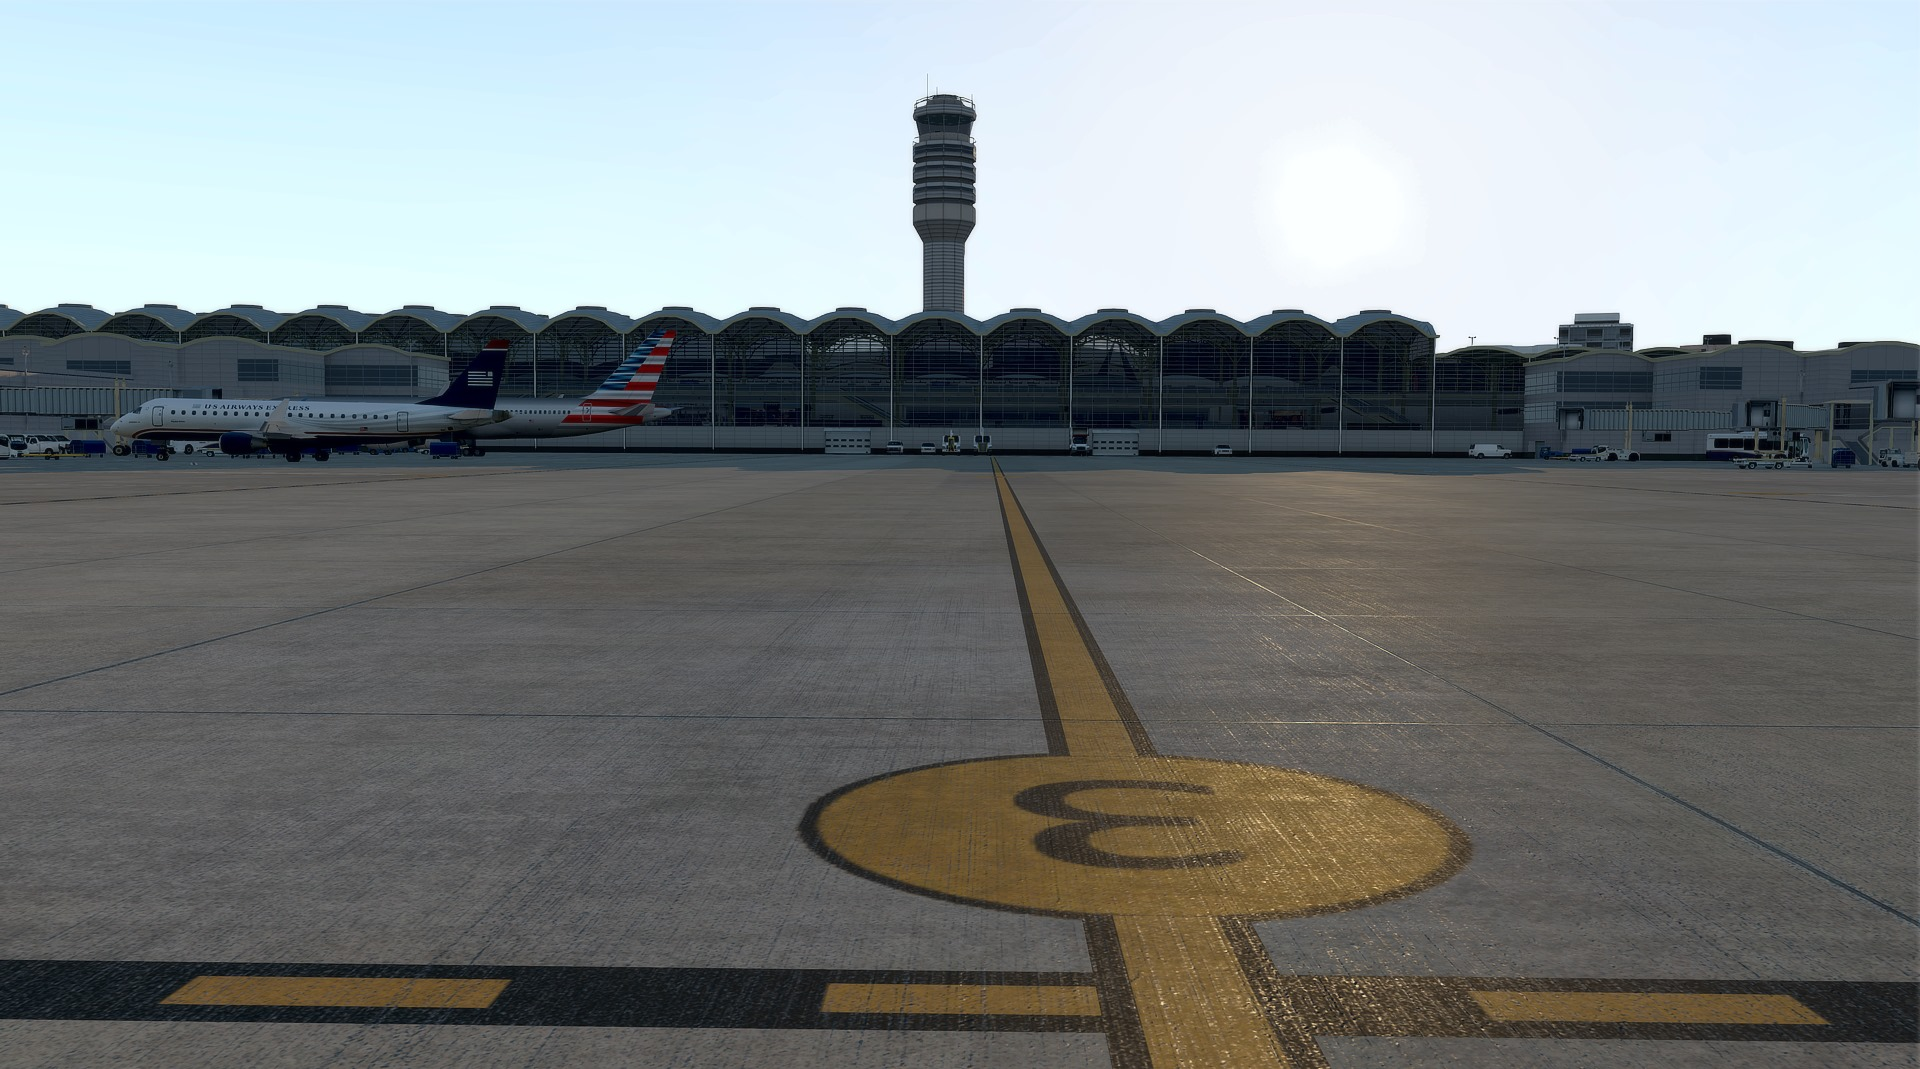 Drzewiecki Design – X-Plane Sceneries Updates